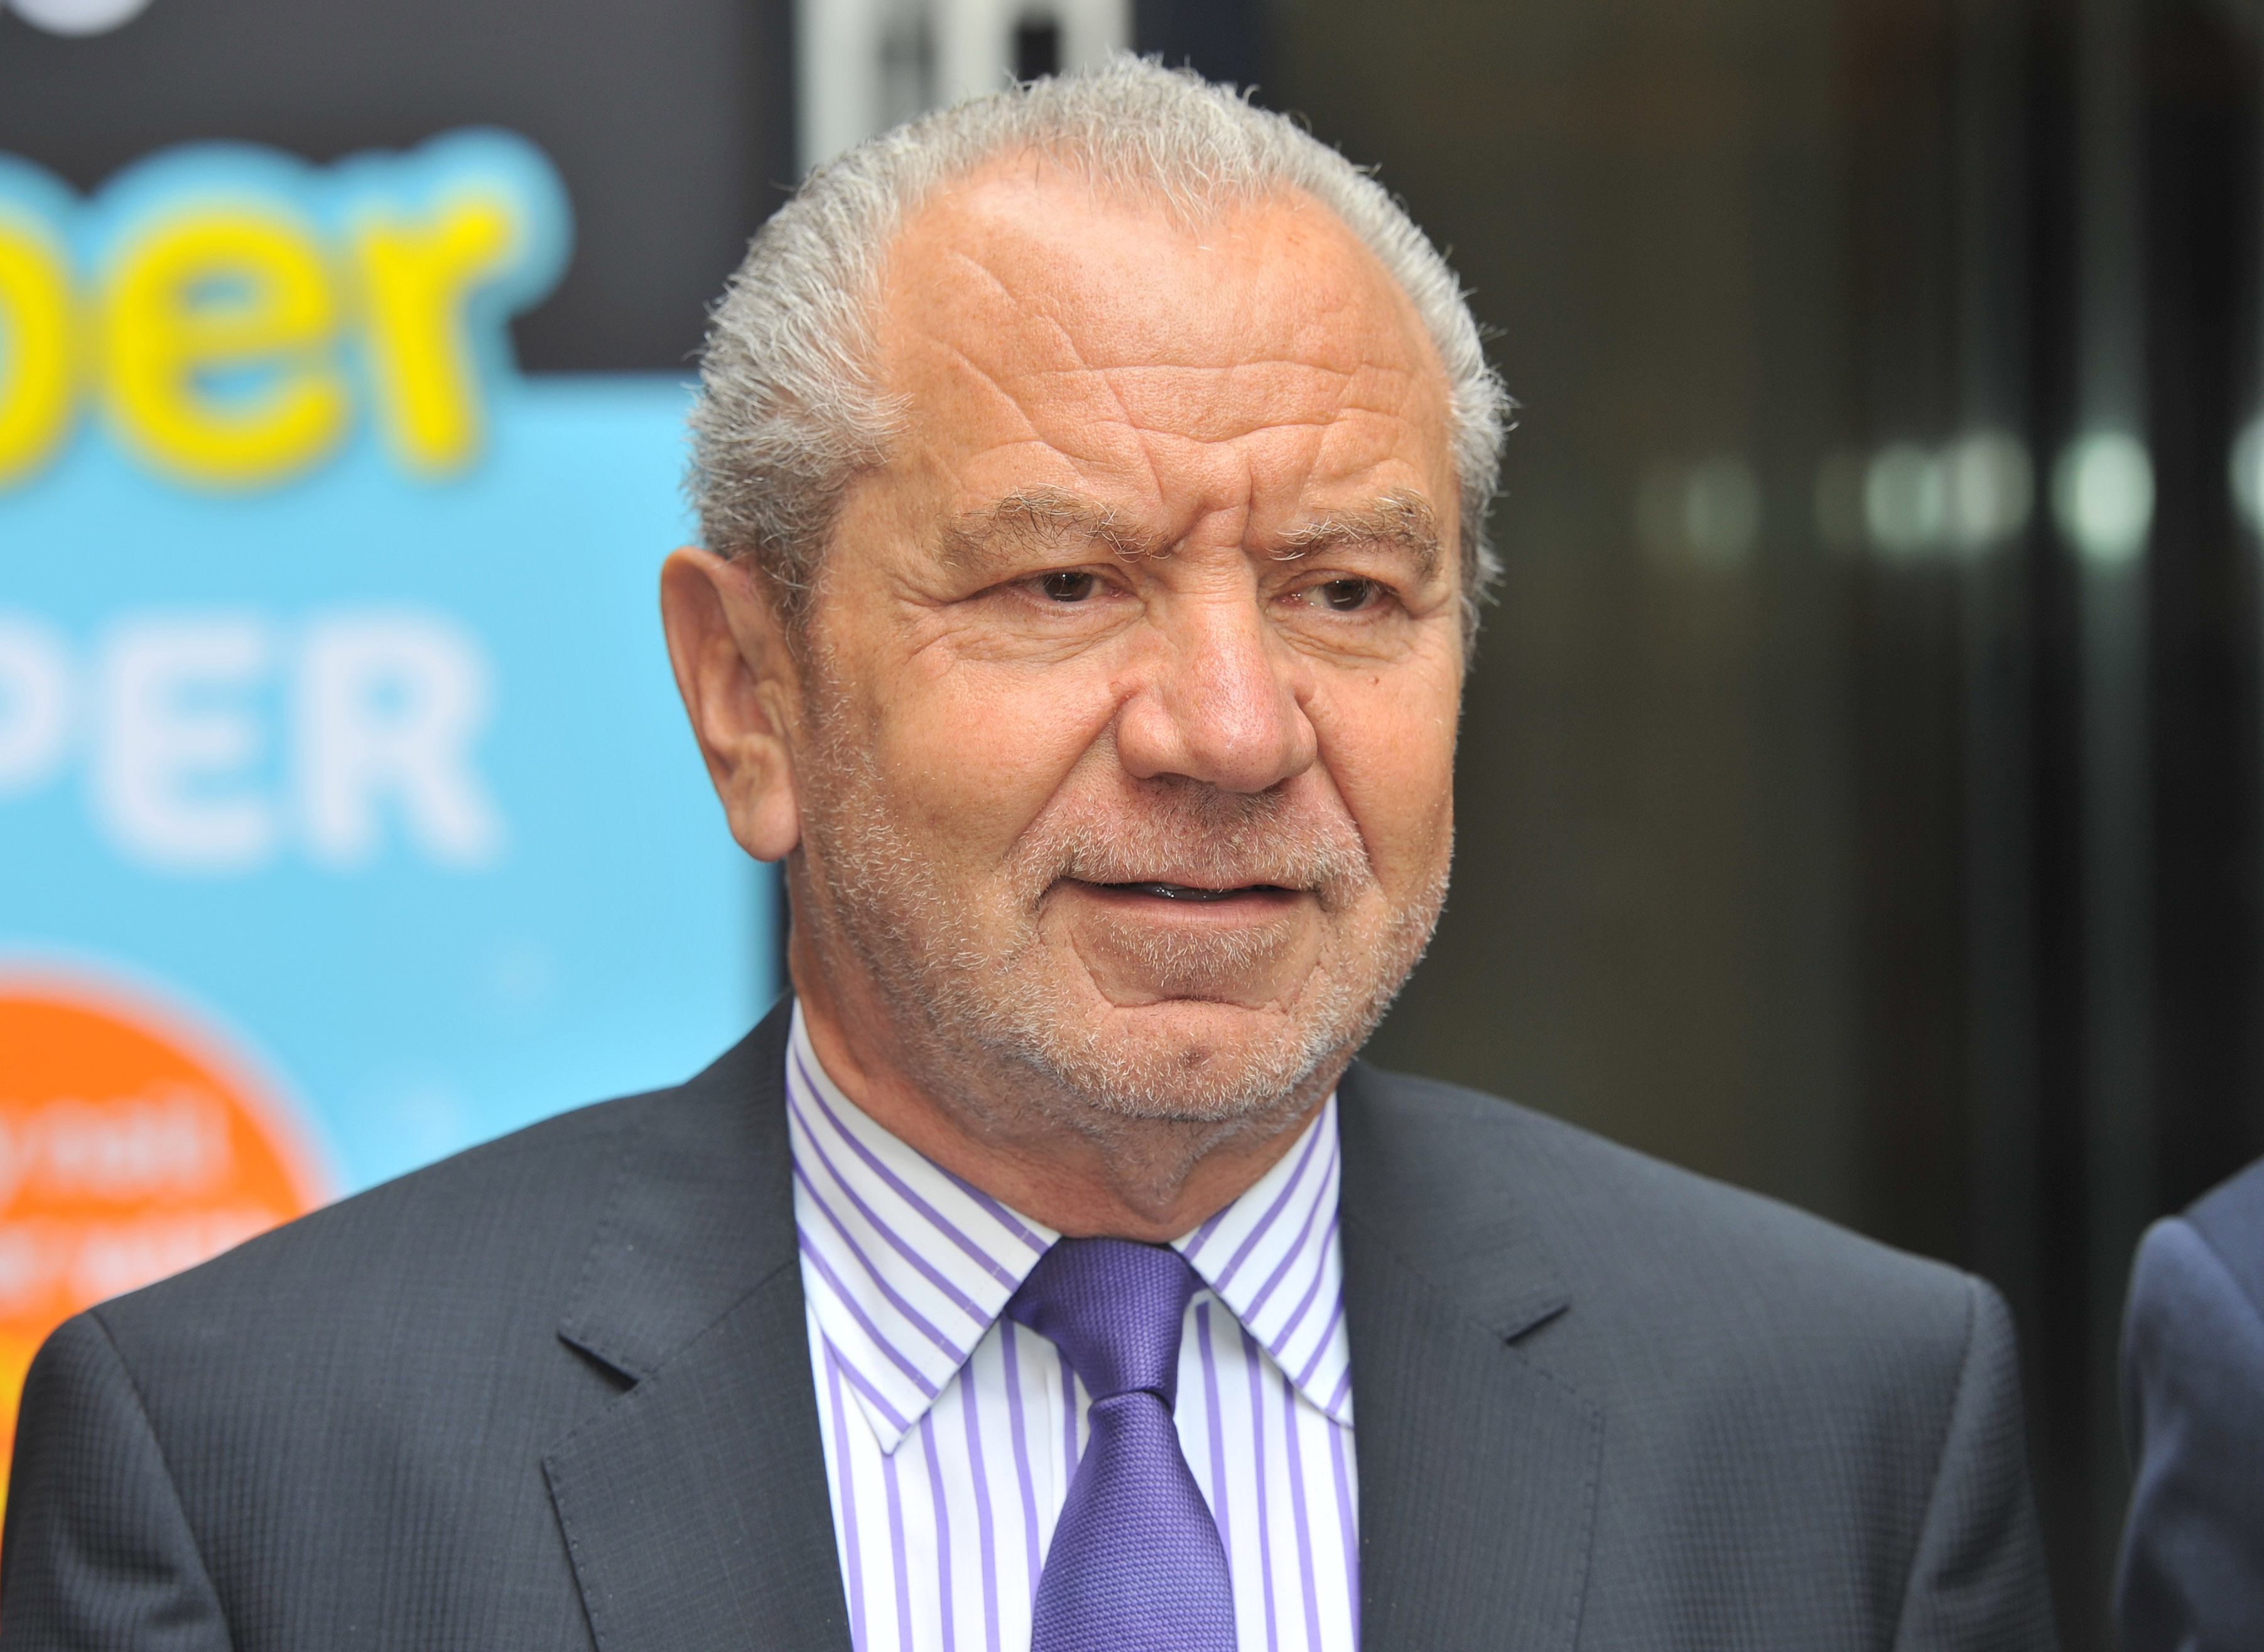 Apprentice fans horrified as Lord Sugar shares gross video on social media